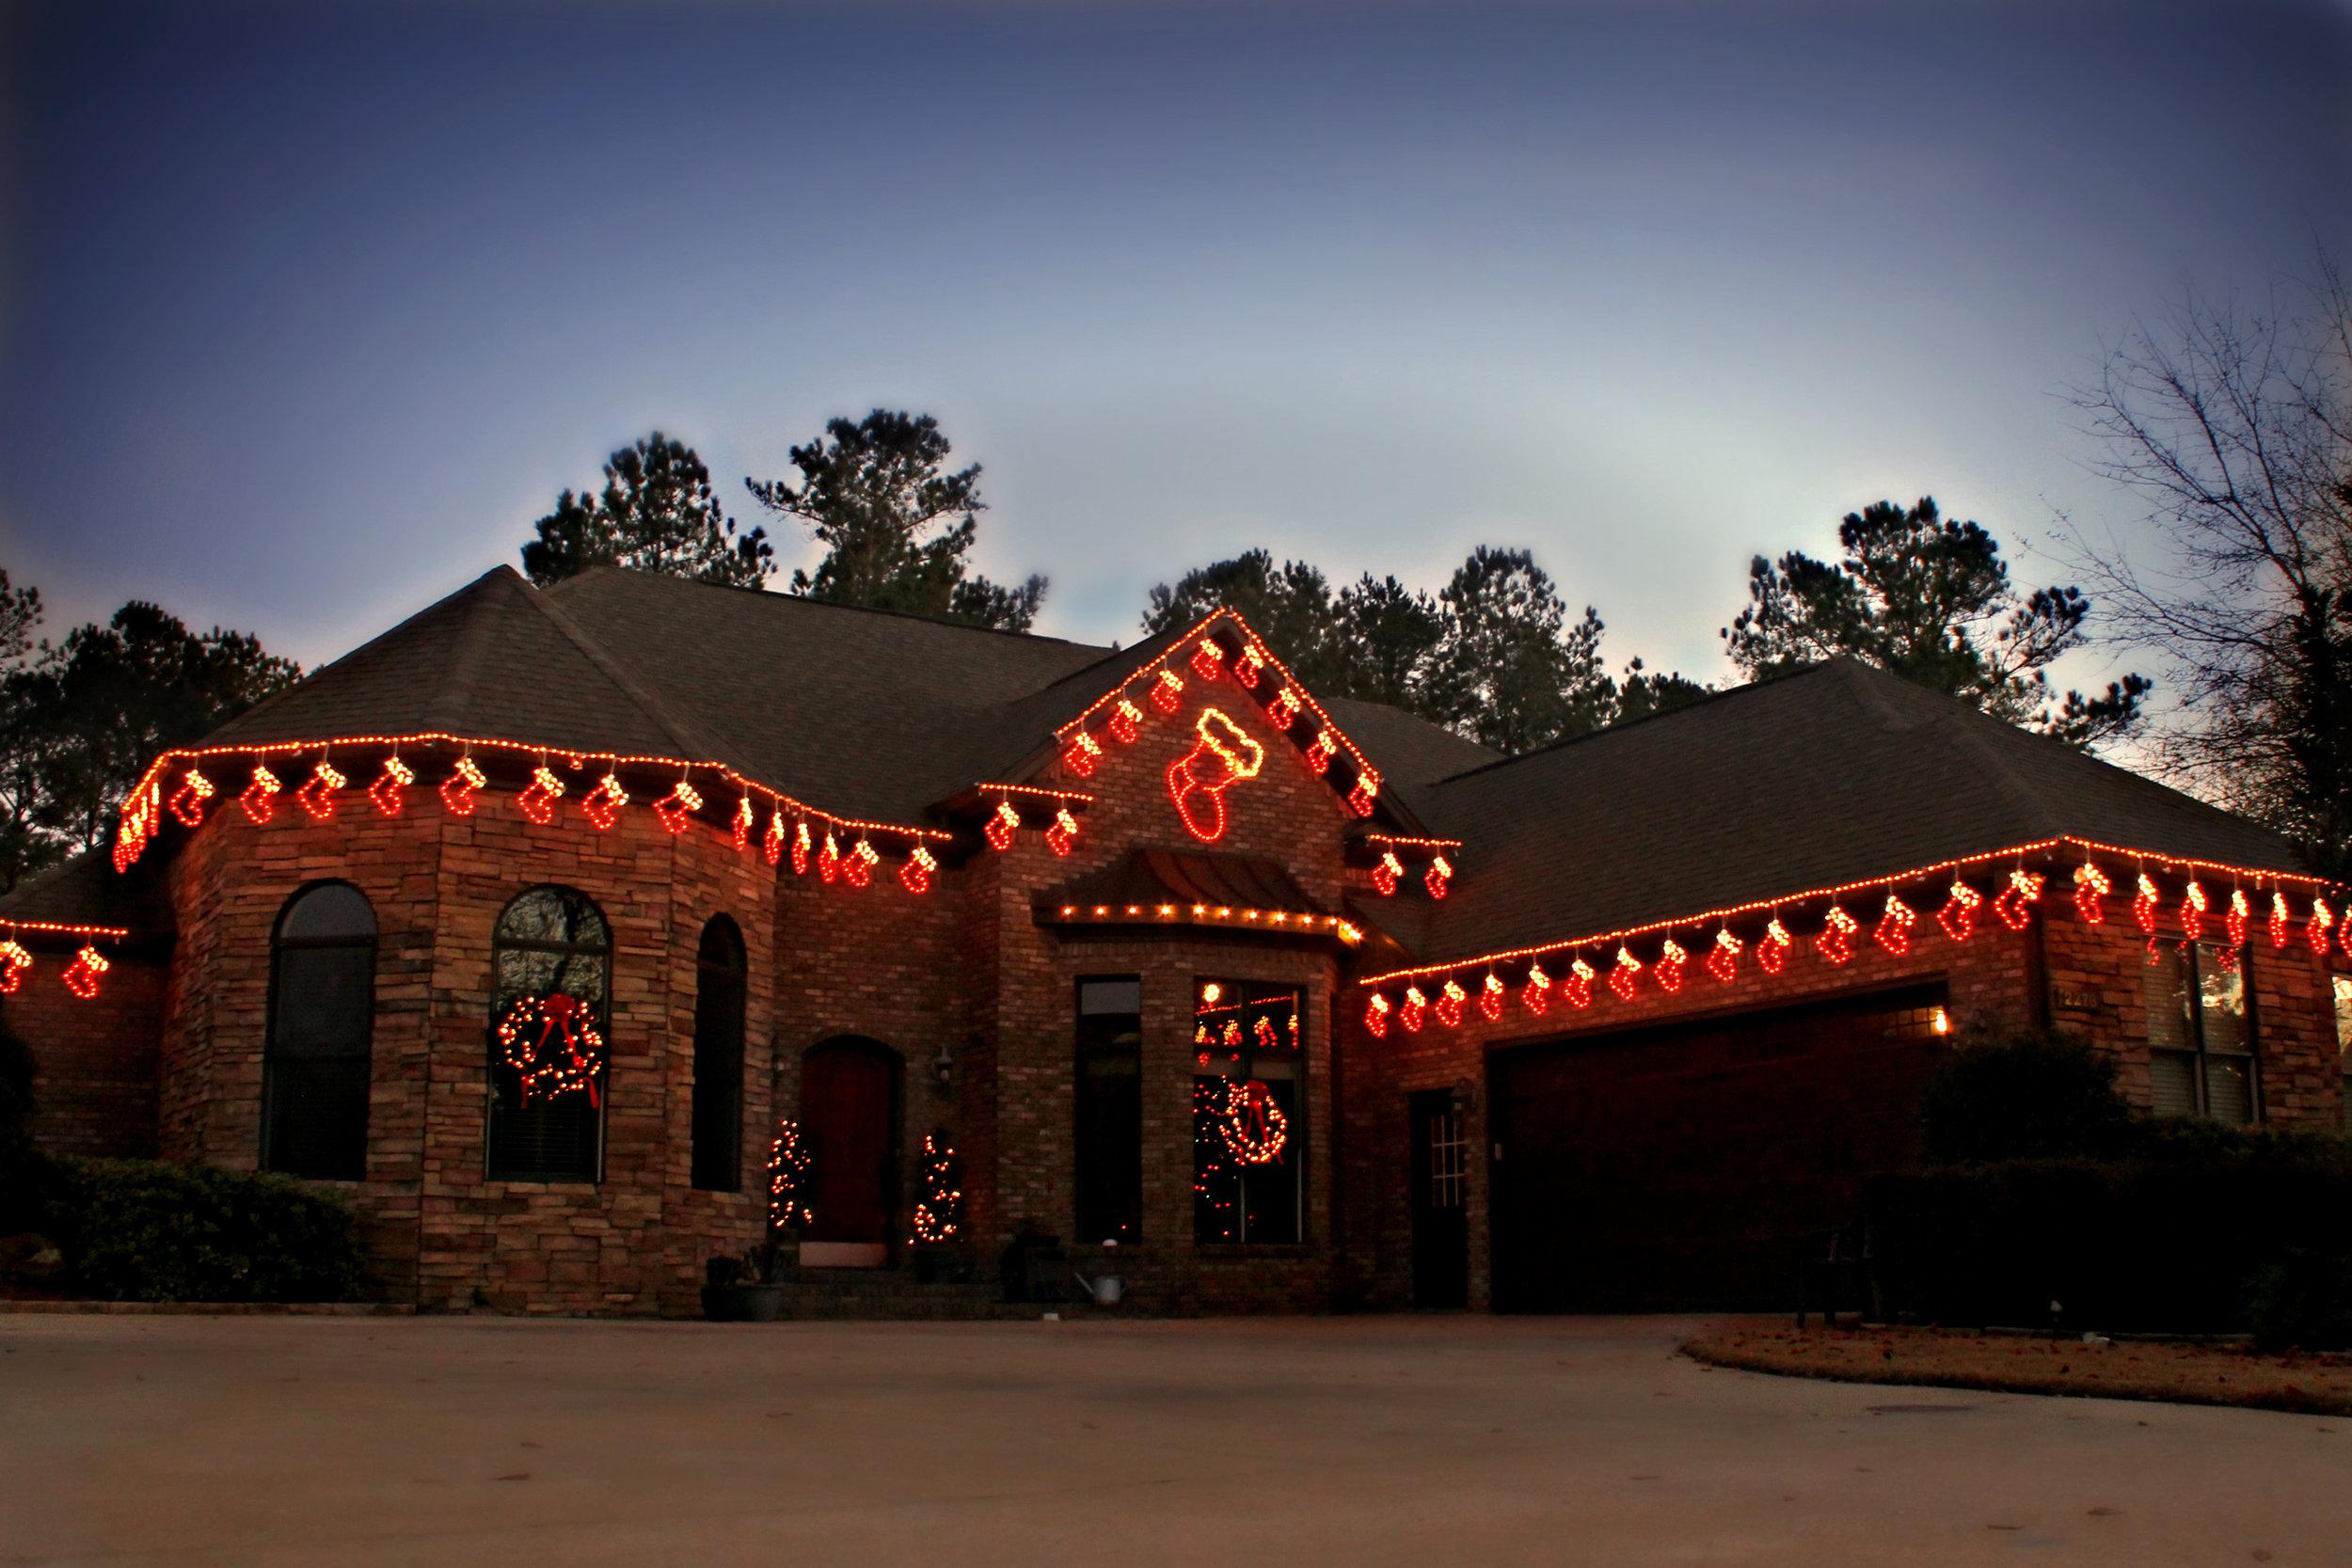 glitter and glow chrismas decor residential exterior (22).jpg